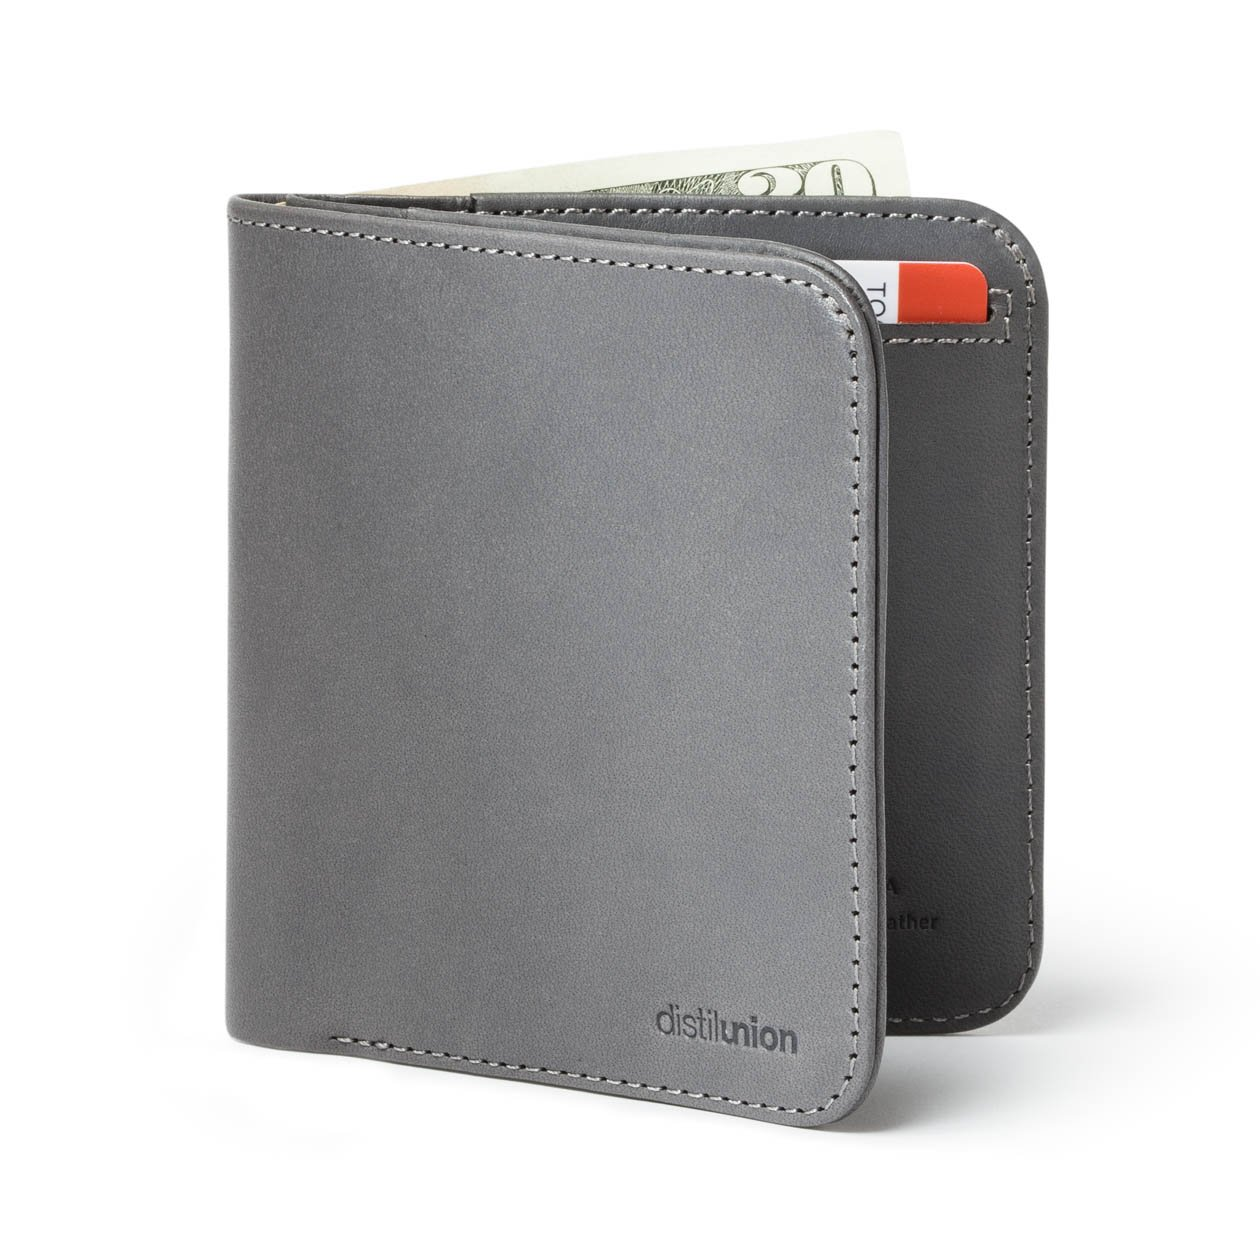 Distil Union/Wally Agent[ウォリーエージェント] メンズ 二つ折りスリム財布 お札入れ&カードホルダー B01N8Q1WMH スレート スレート